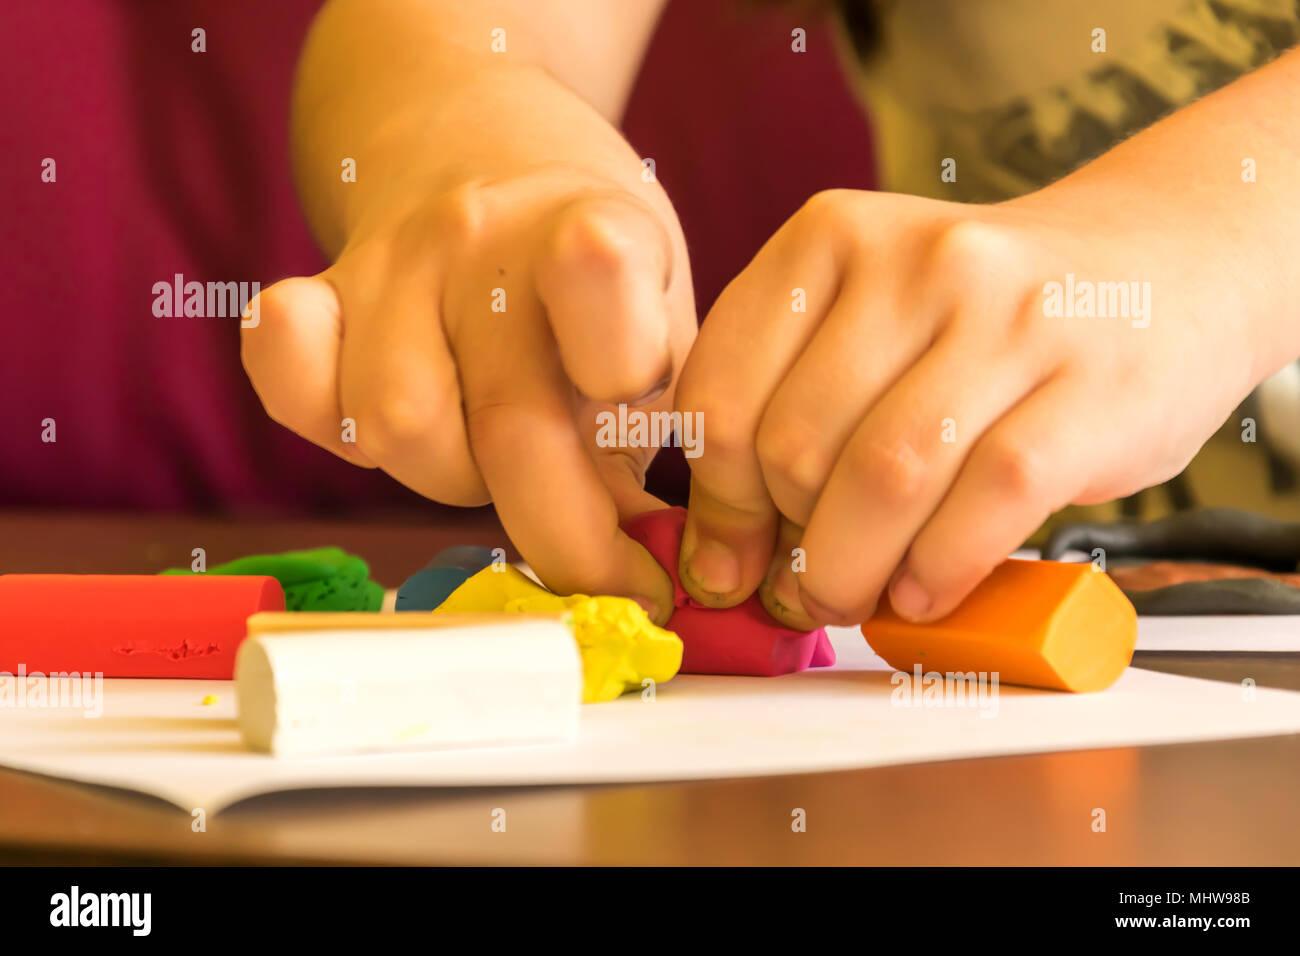 Child modeling plasticine.   Developing imagination and creativity. - Stock Image